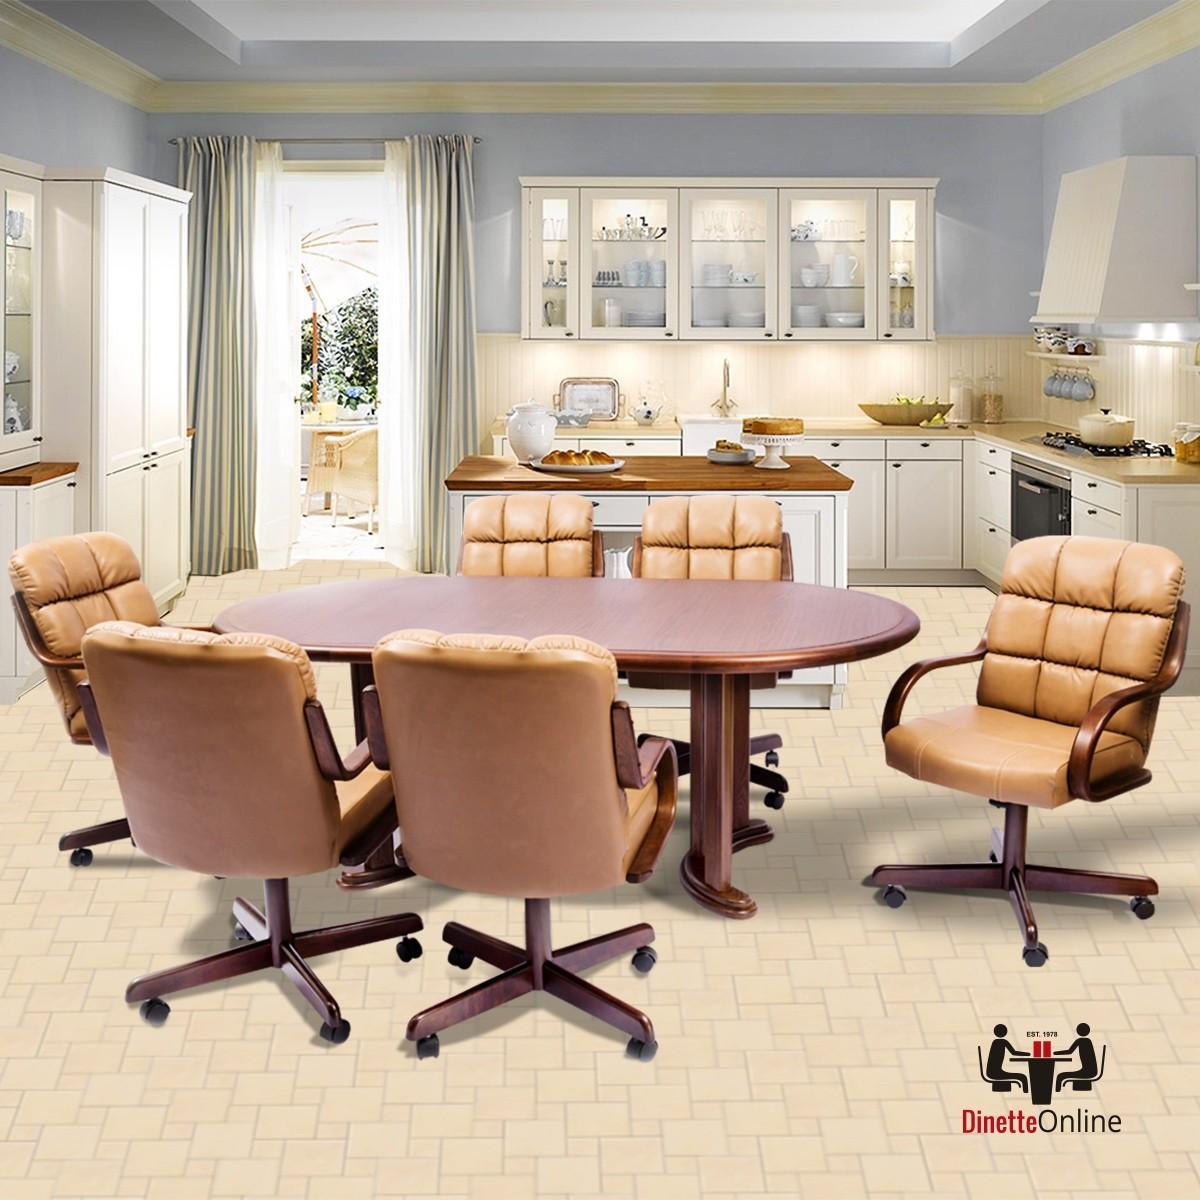 Douglas Furniture Joan Swivel Tilt Caster 5 PC Laminate